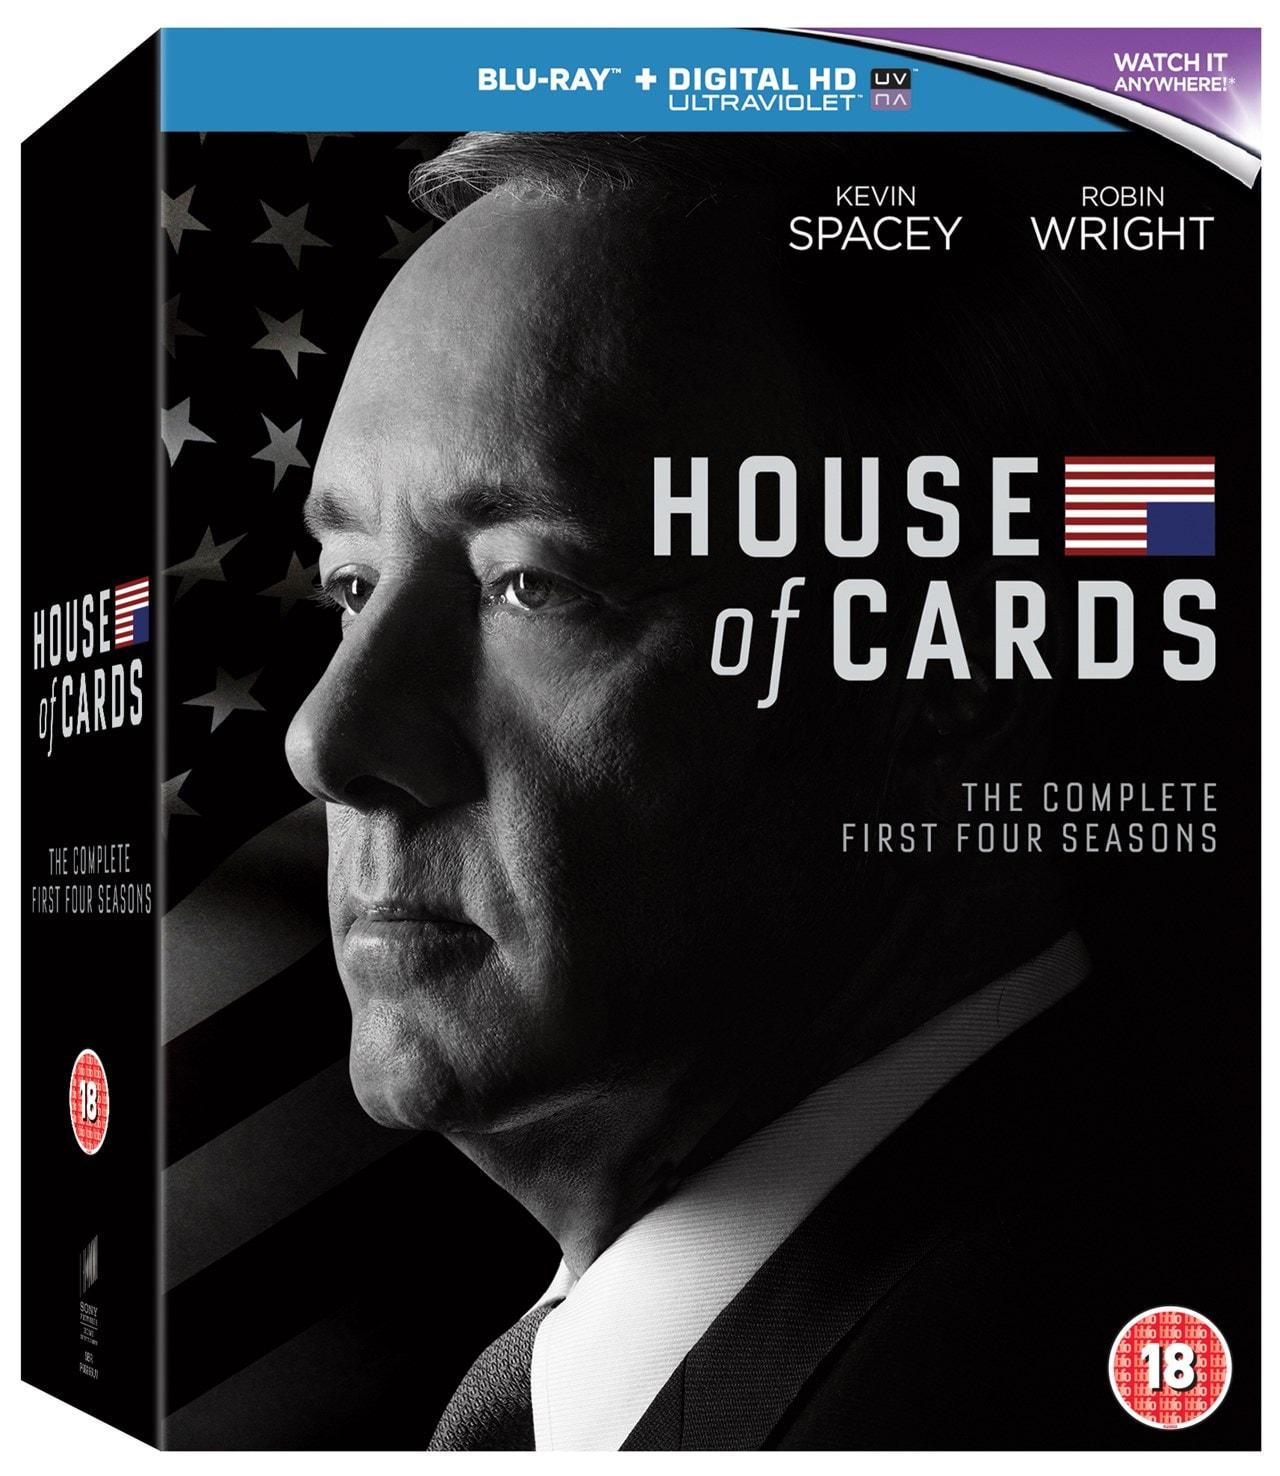 House Of Cards Seasons 1 4 Blu Ray Box Set Free Shipping Over 20 Hmv Store